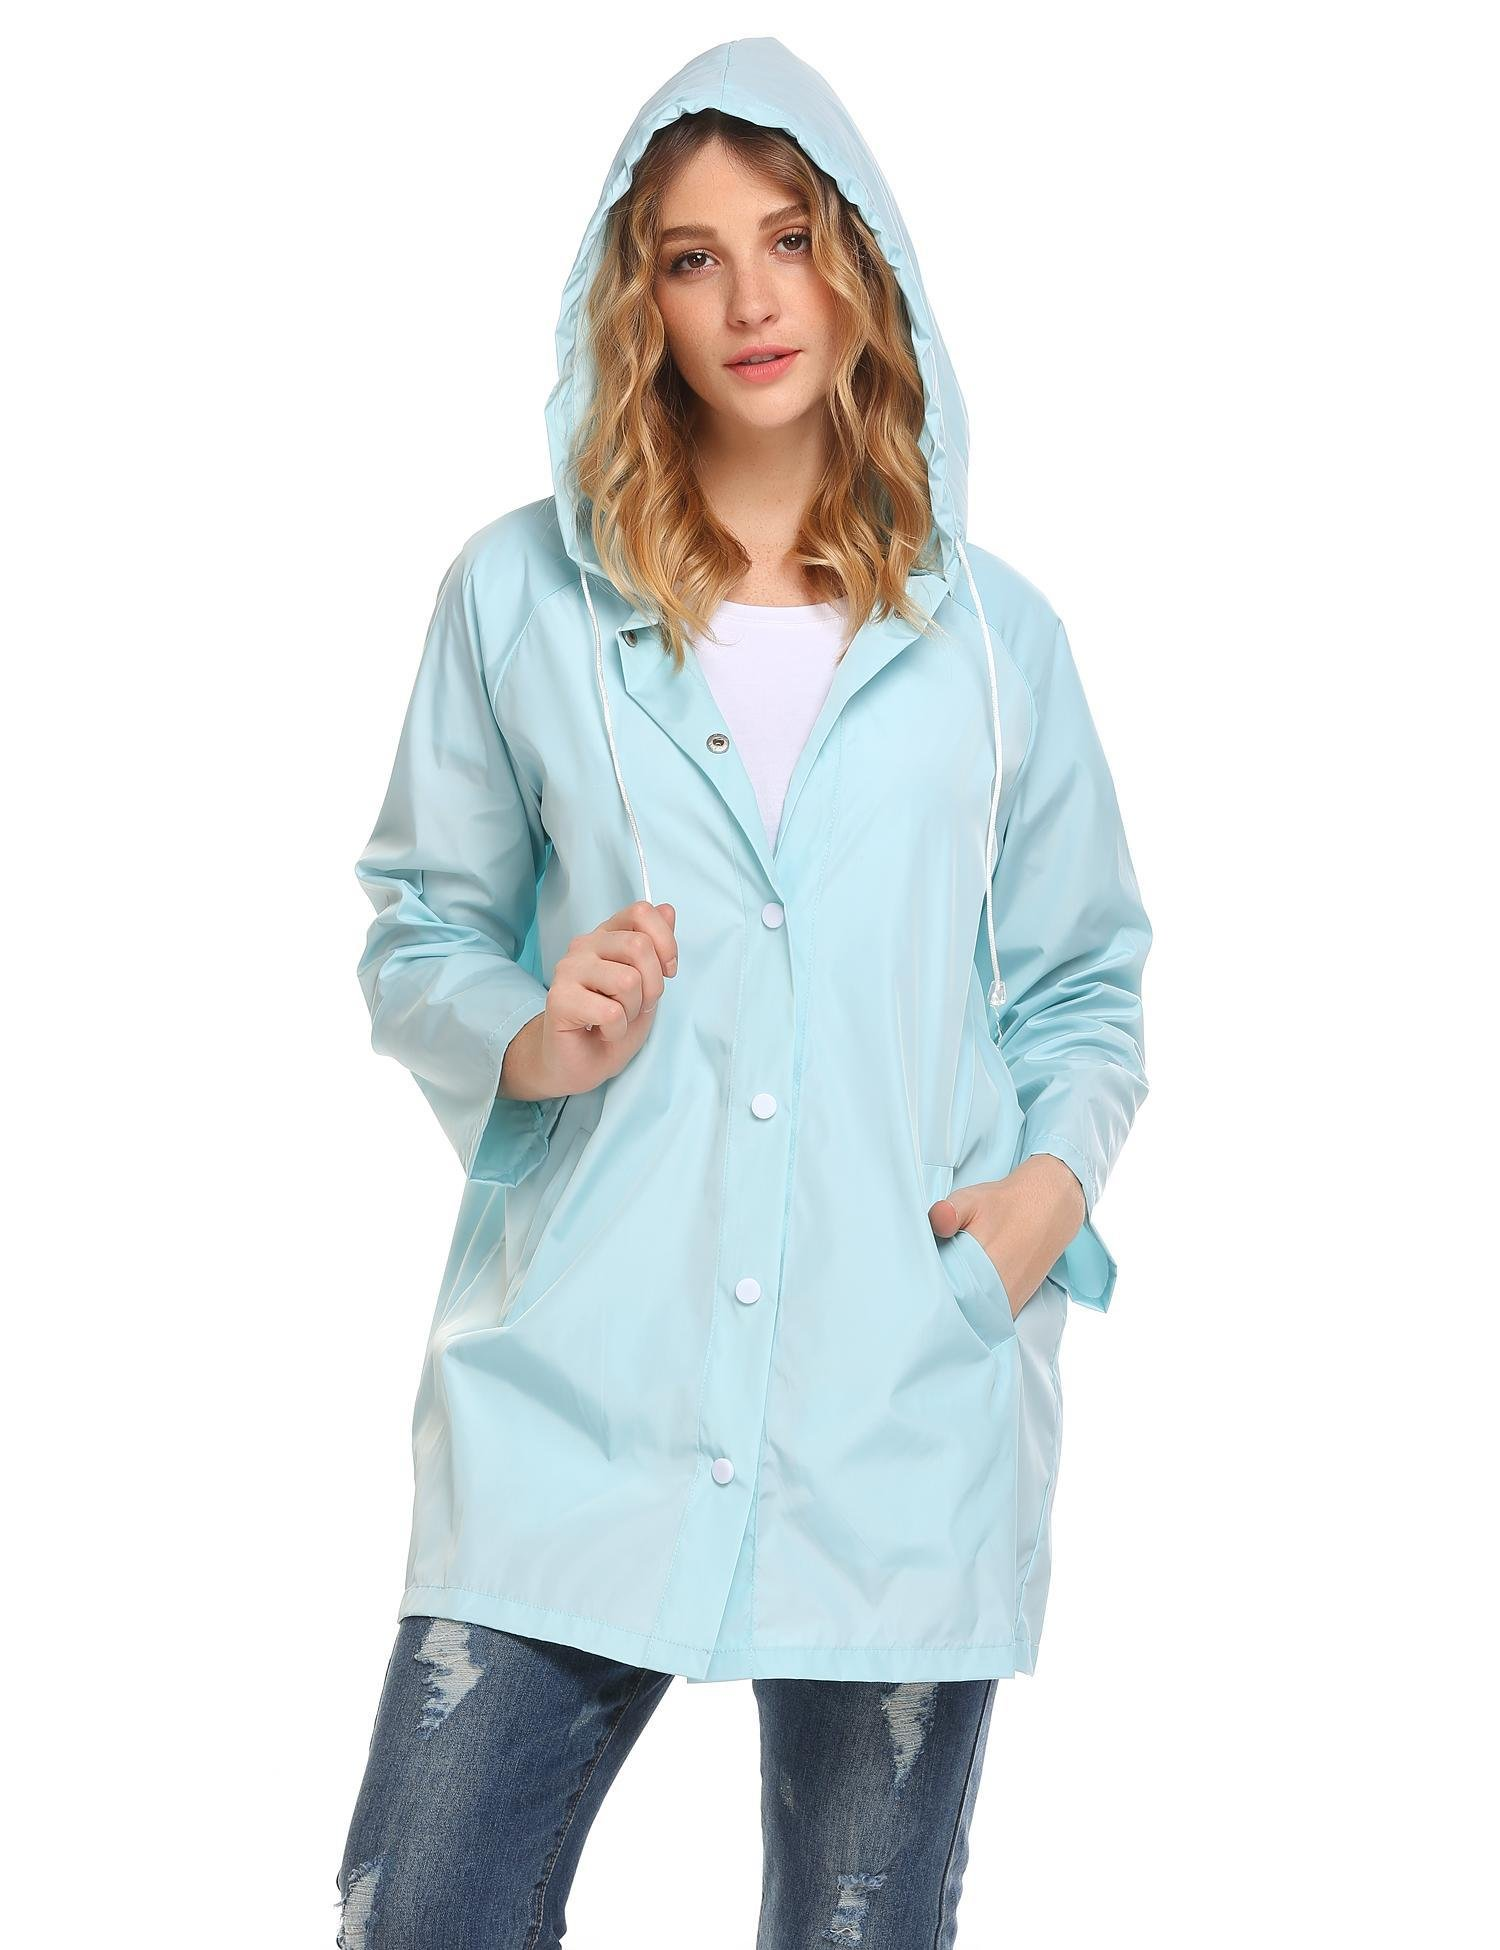 SoTeer Women Waterproof Lightweight Rain Jacket Outdoor Hooded Raincoat(Light Blue-XXL)